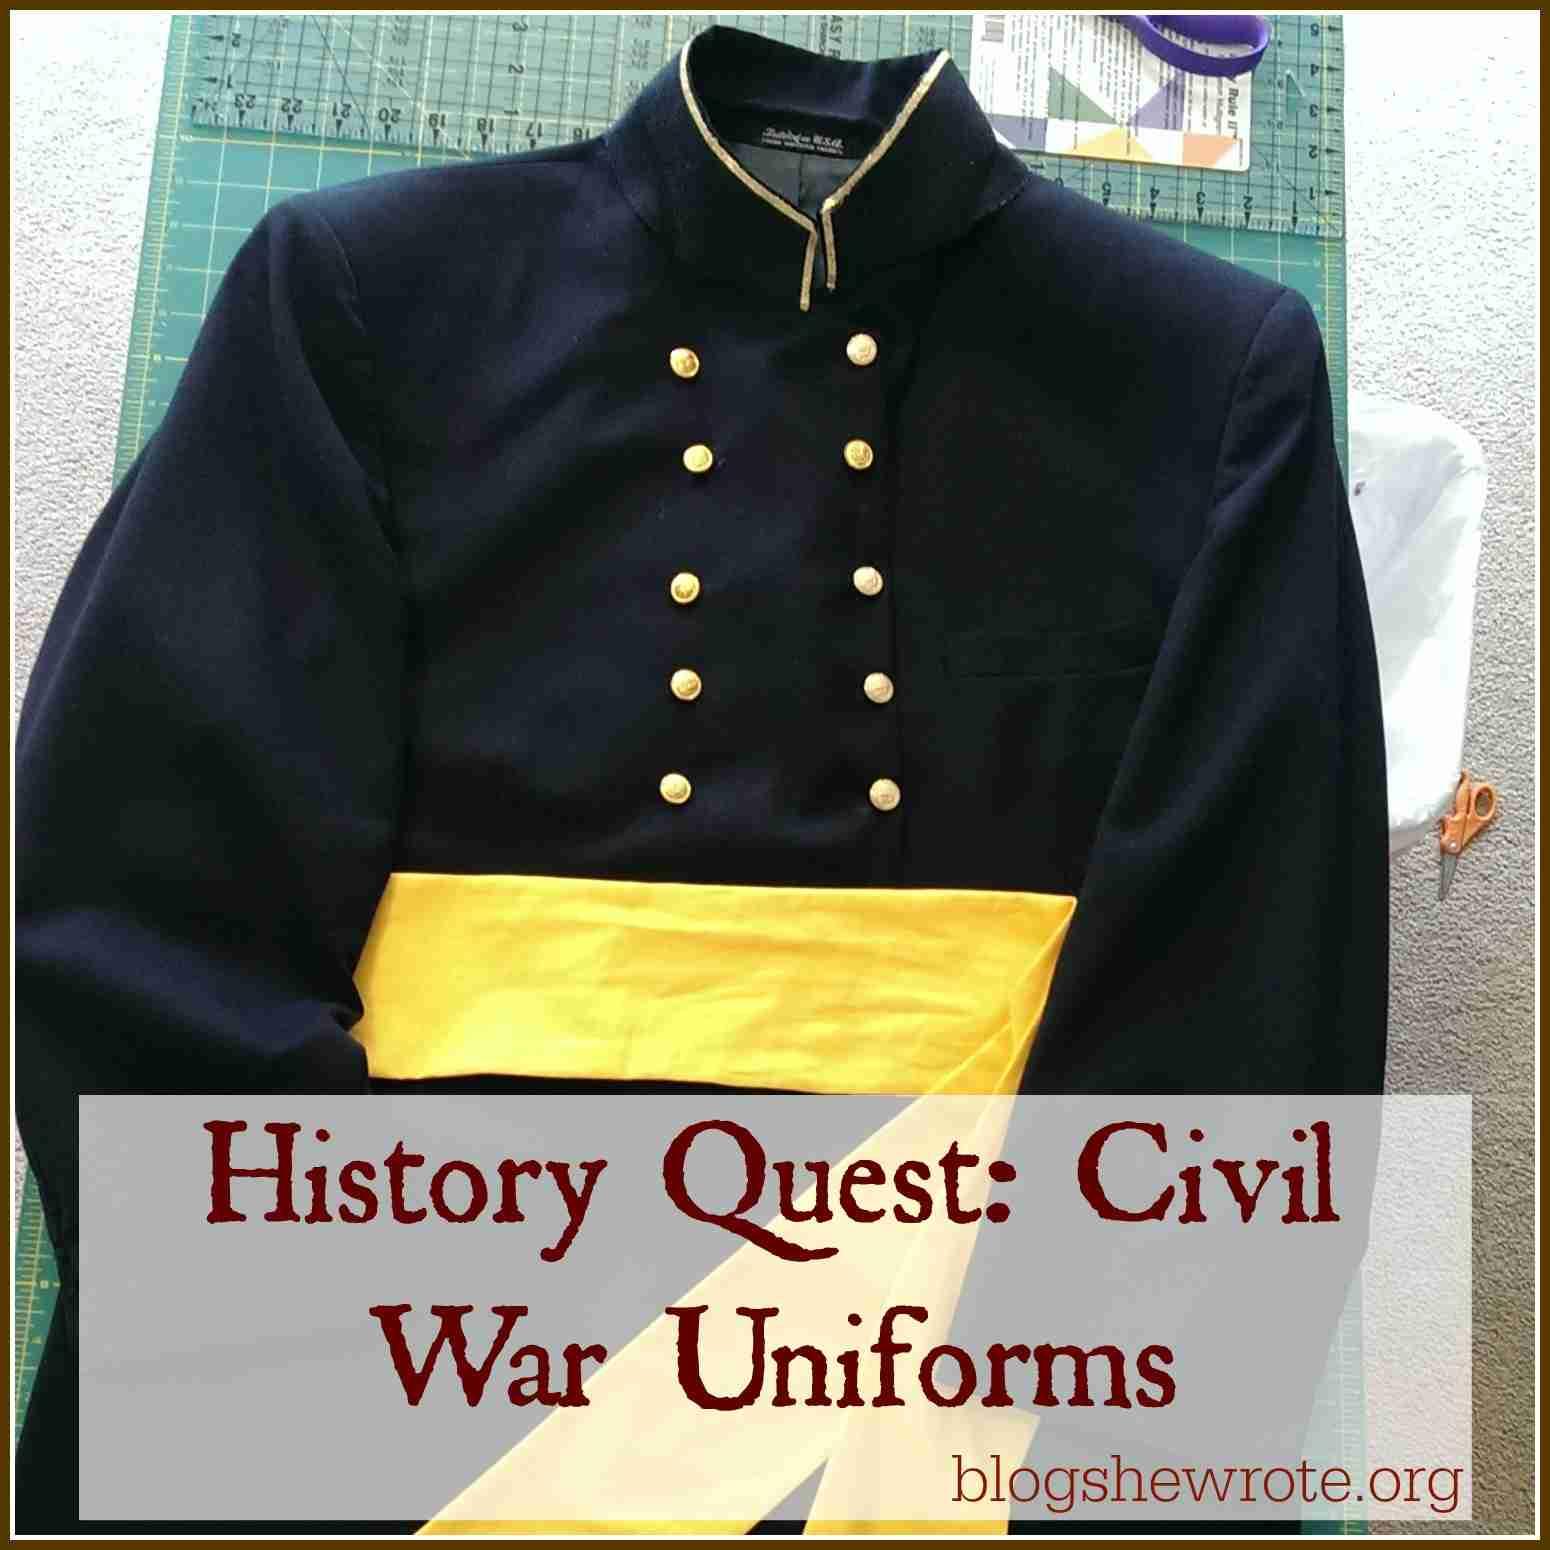 Blog, She Wrote: History Quest- Civil War Uniforms